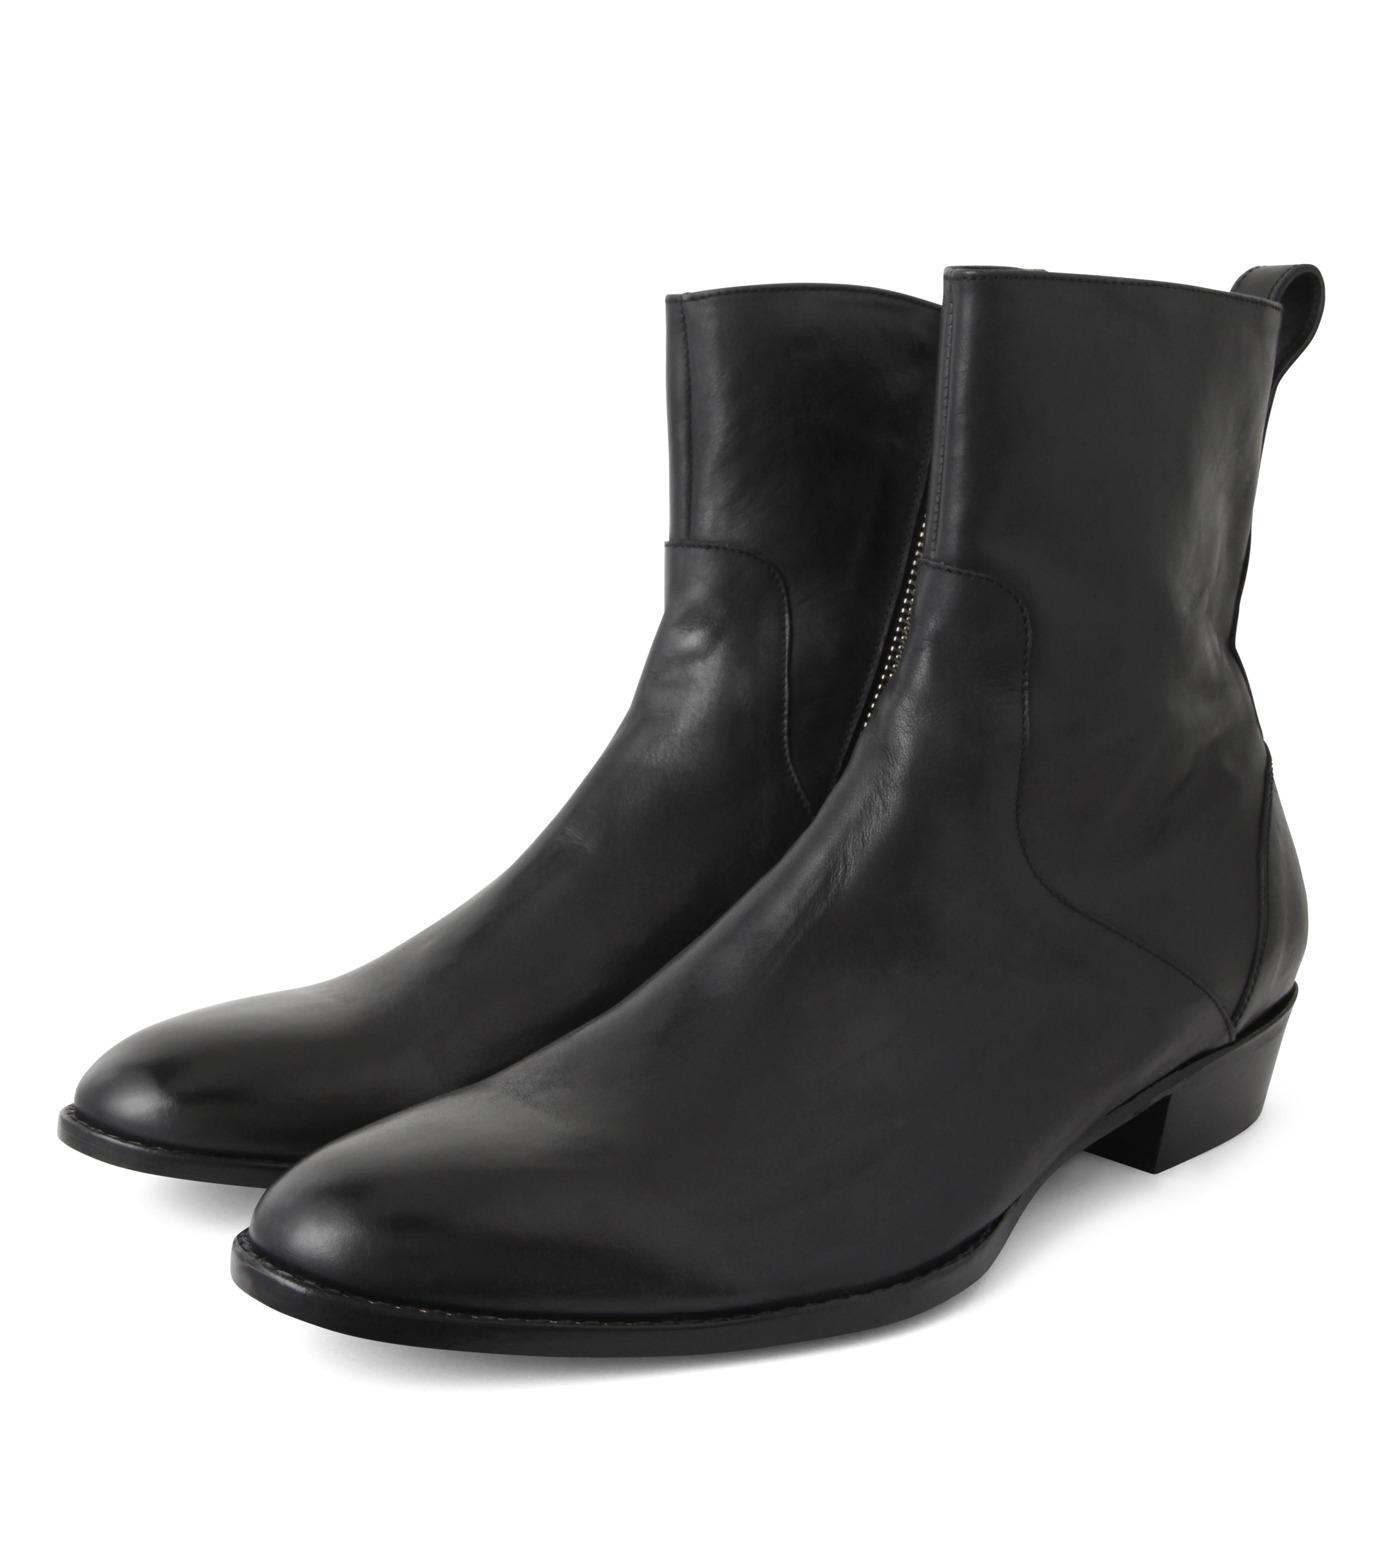 HL HEDDIE LOVU(エイチエル・エディールーヴ)のSIDE ZIP BOOTS-BLACK(シューズ/shoes)-18S90002-13 拡大詳細画像4